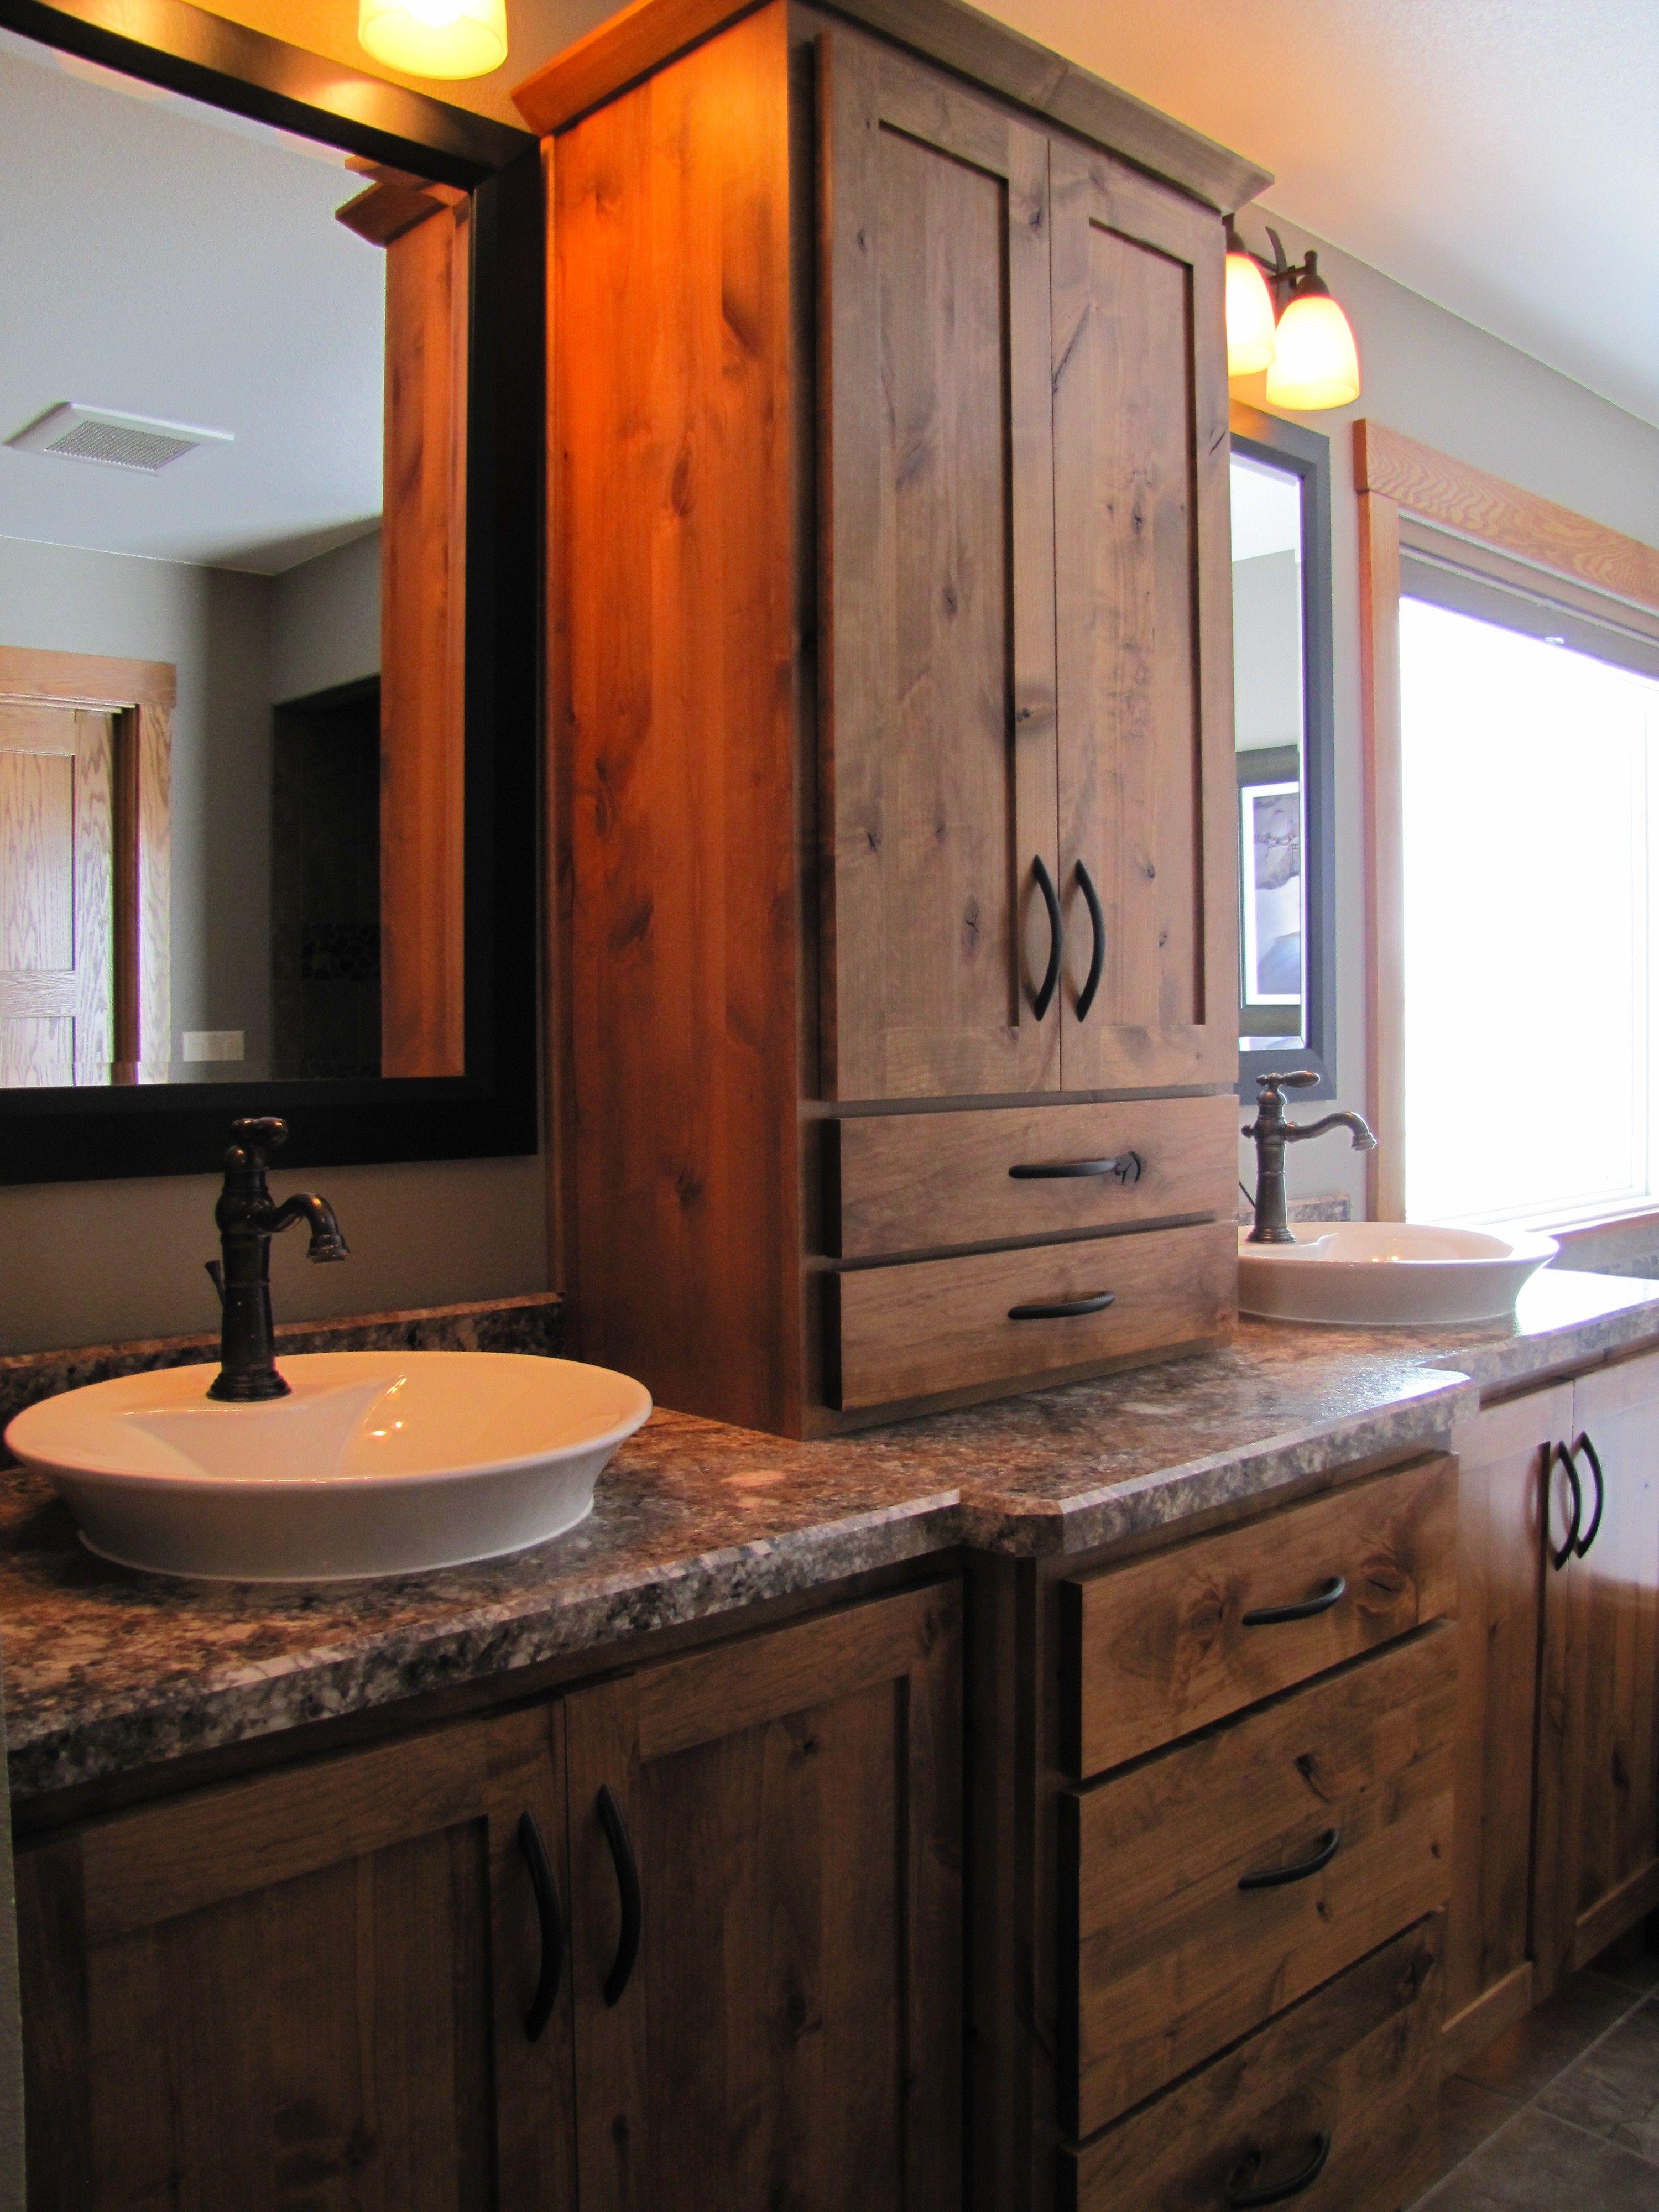 bathroom vanities cabinets sitemenardscom simple and affordable vanity bathroom cabinets home furniture rustic bathroom vanities rusti - Menards Bathroom Vanities